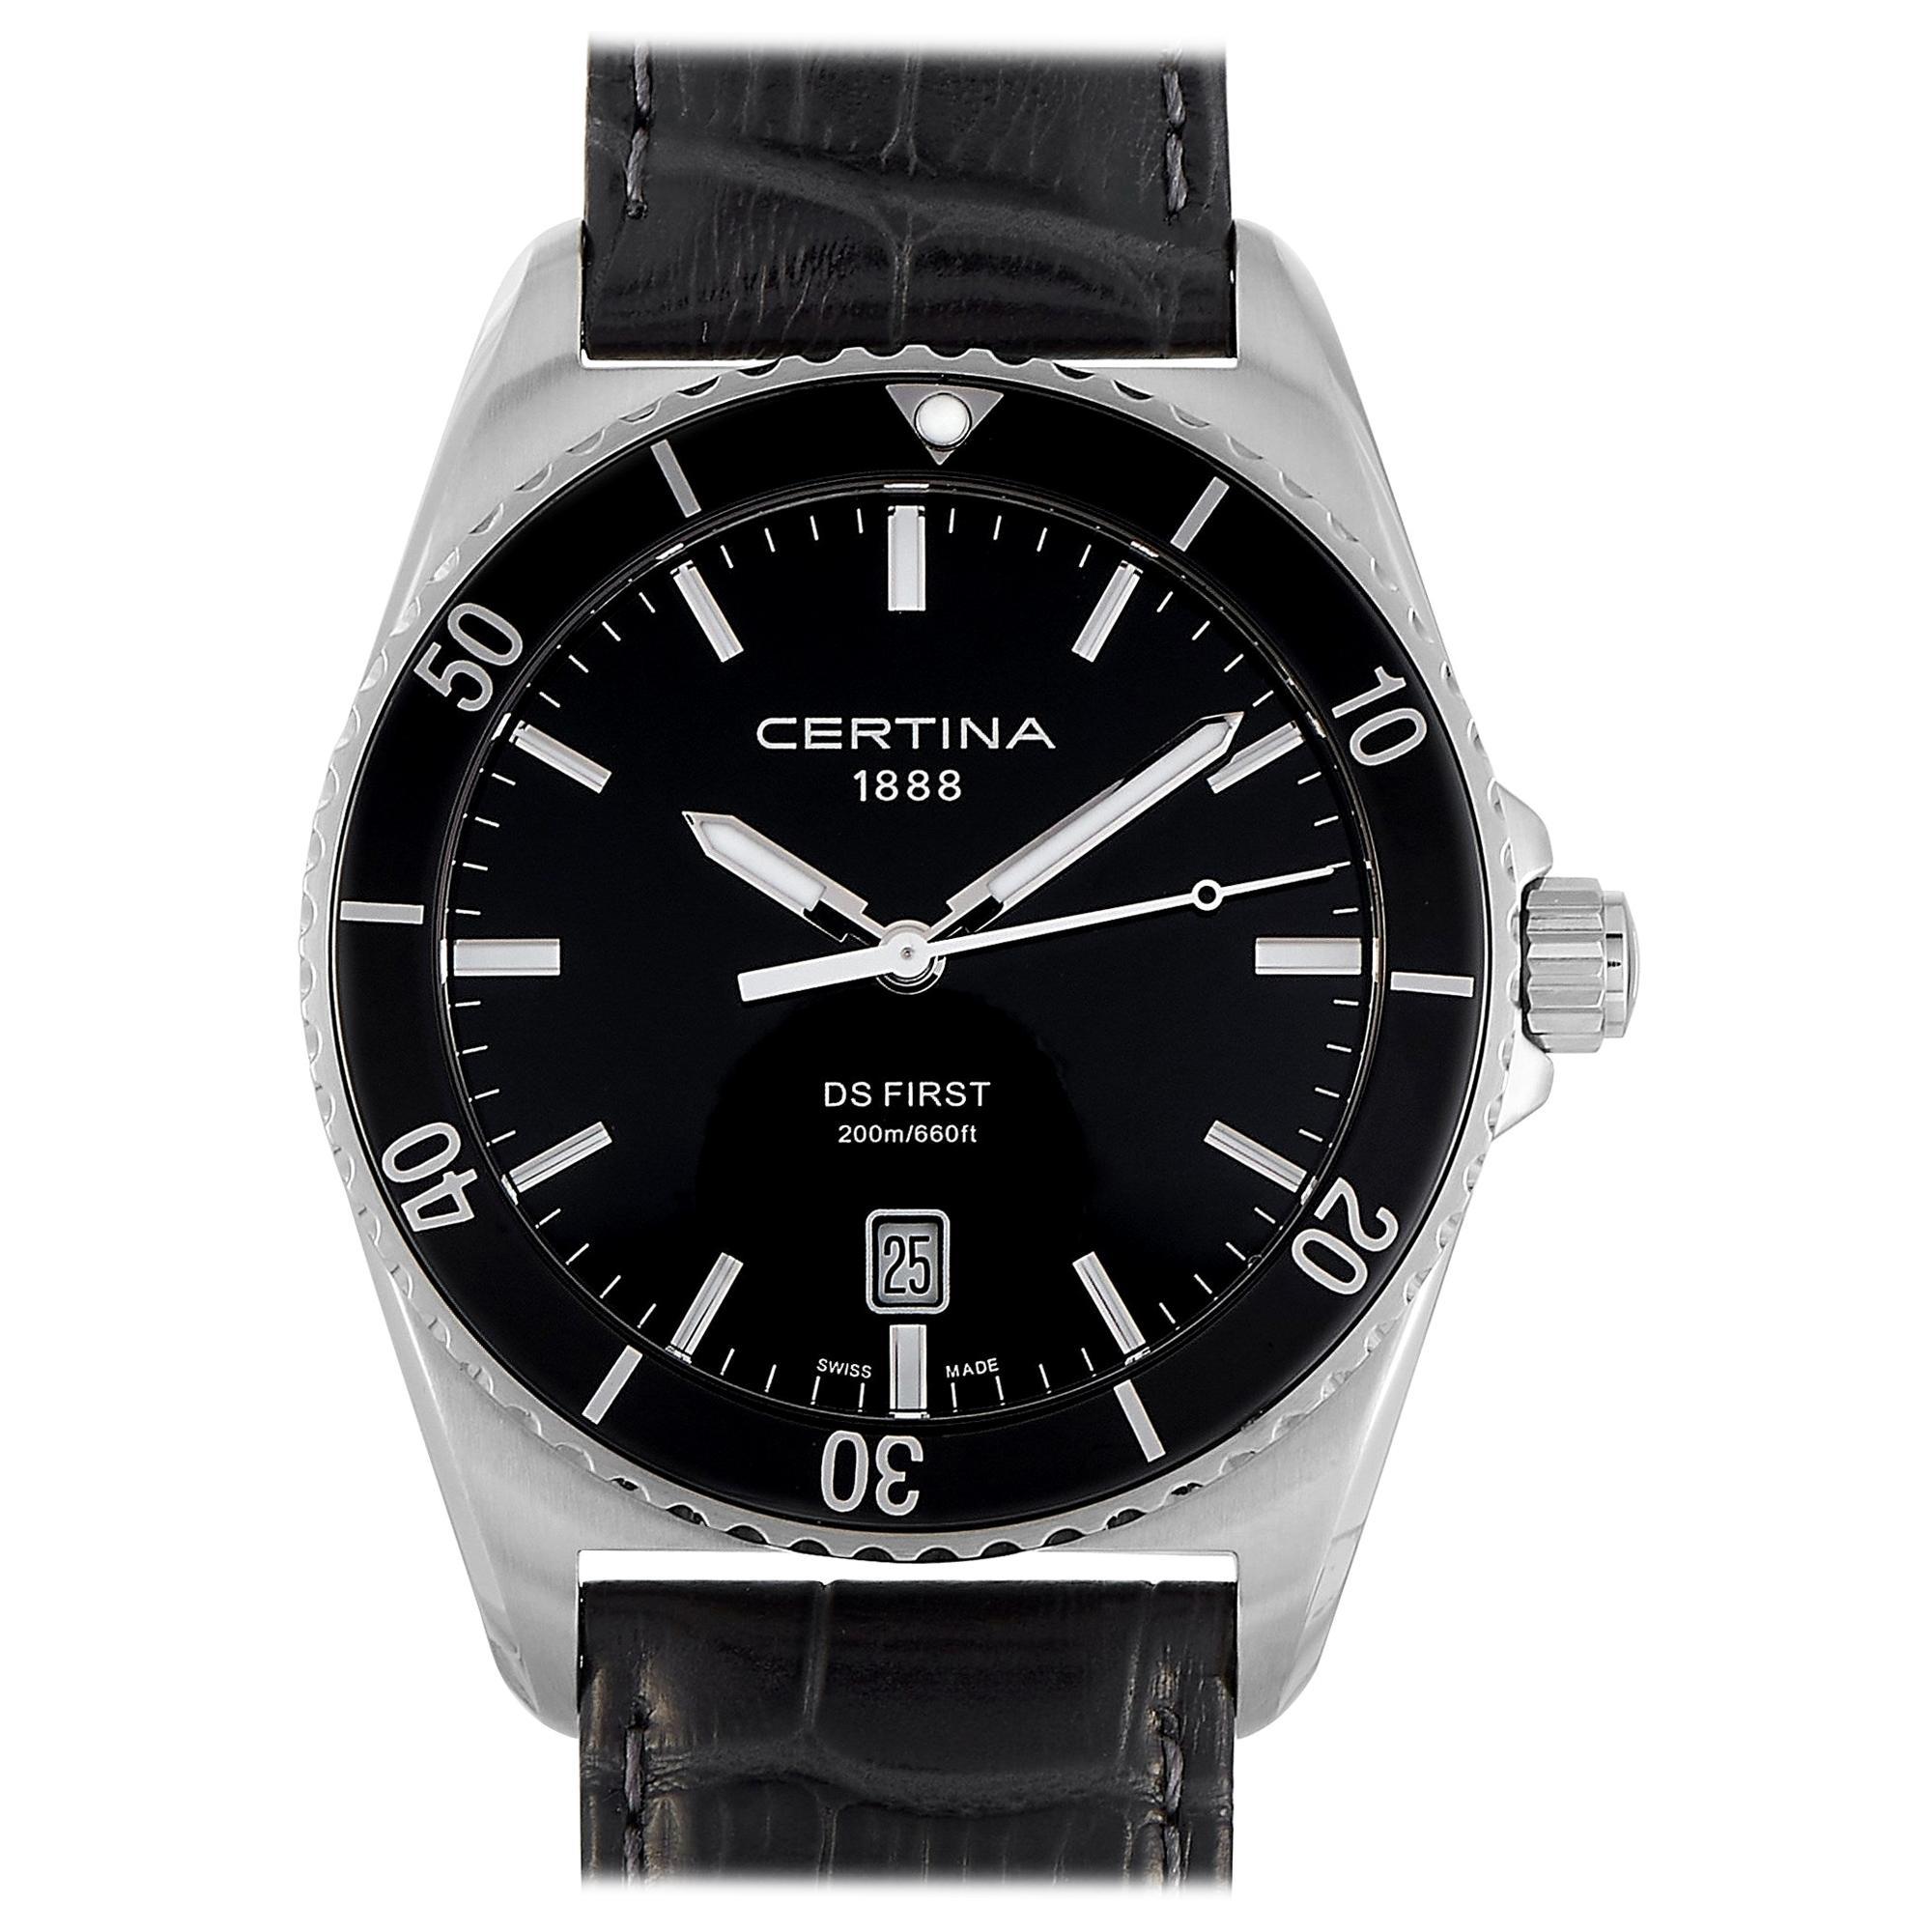 Certina DS First Ceramic Black Leather Men's Watch C014.410.16.051.00